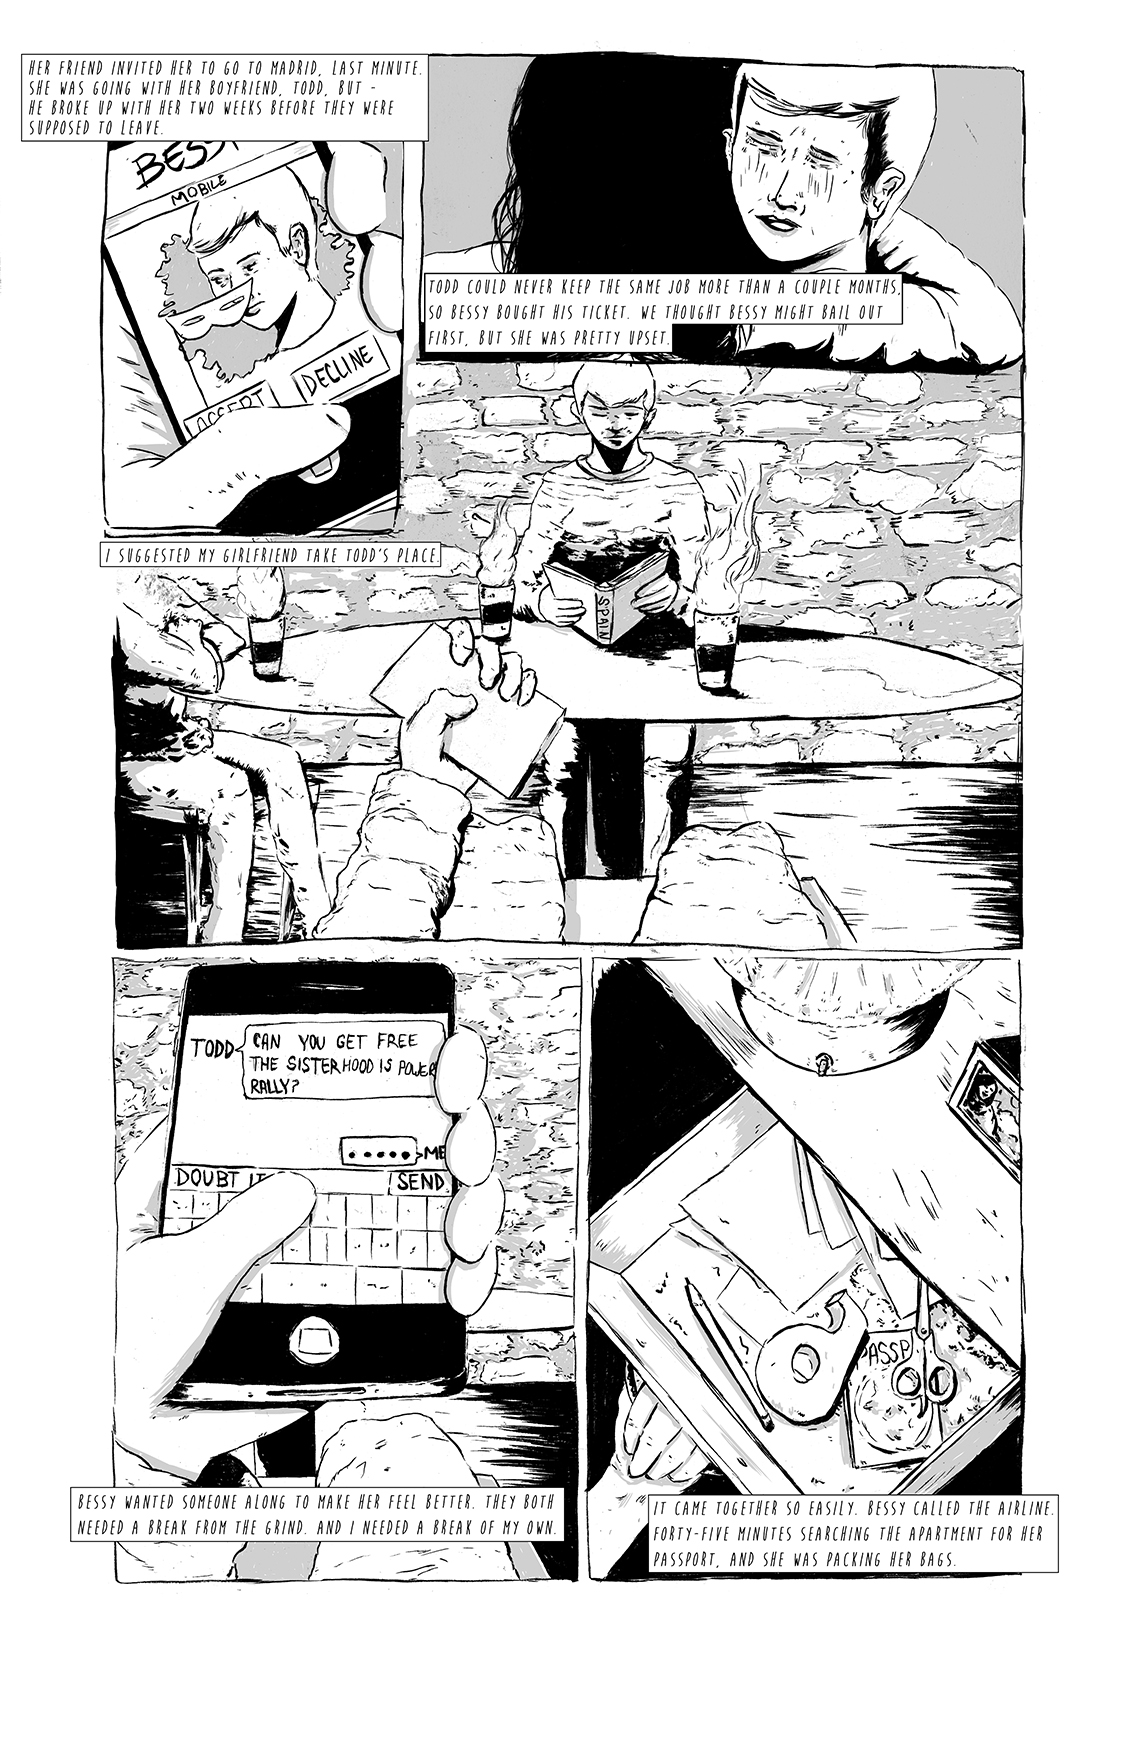 Eight Days Alone, page 2, by Sam Costello and Matthew Goik